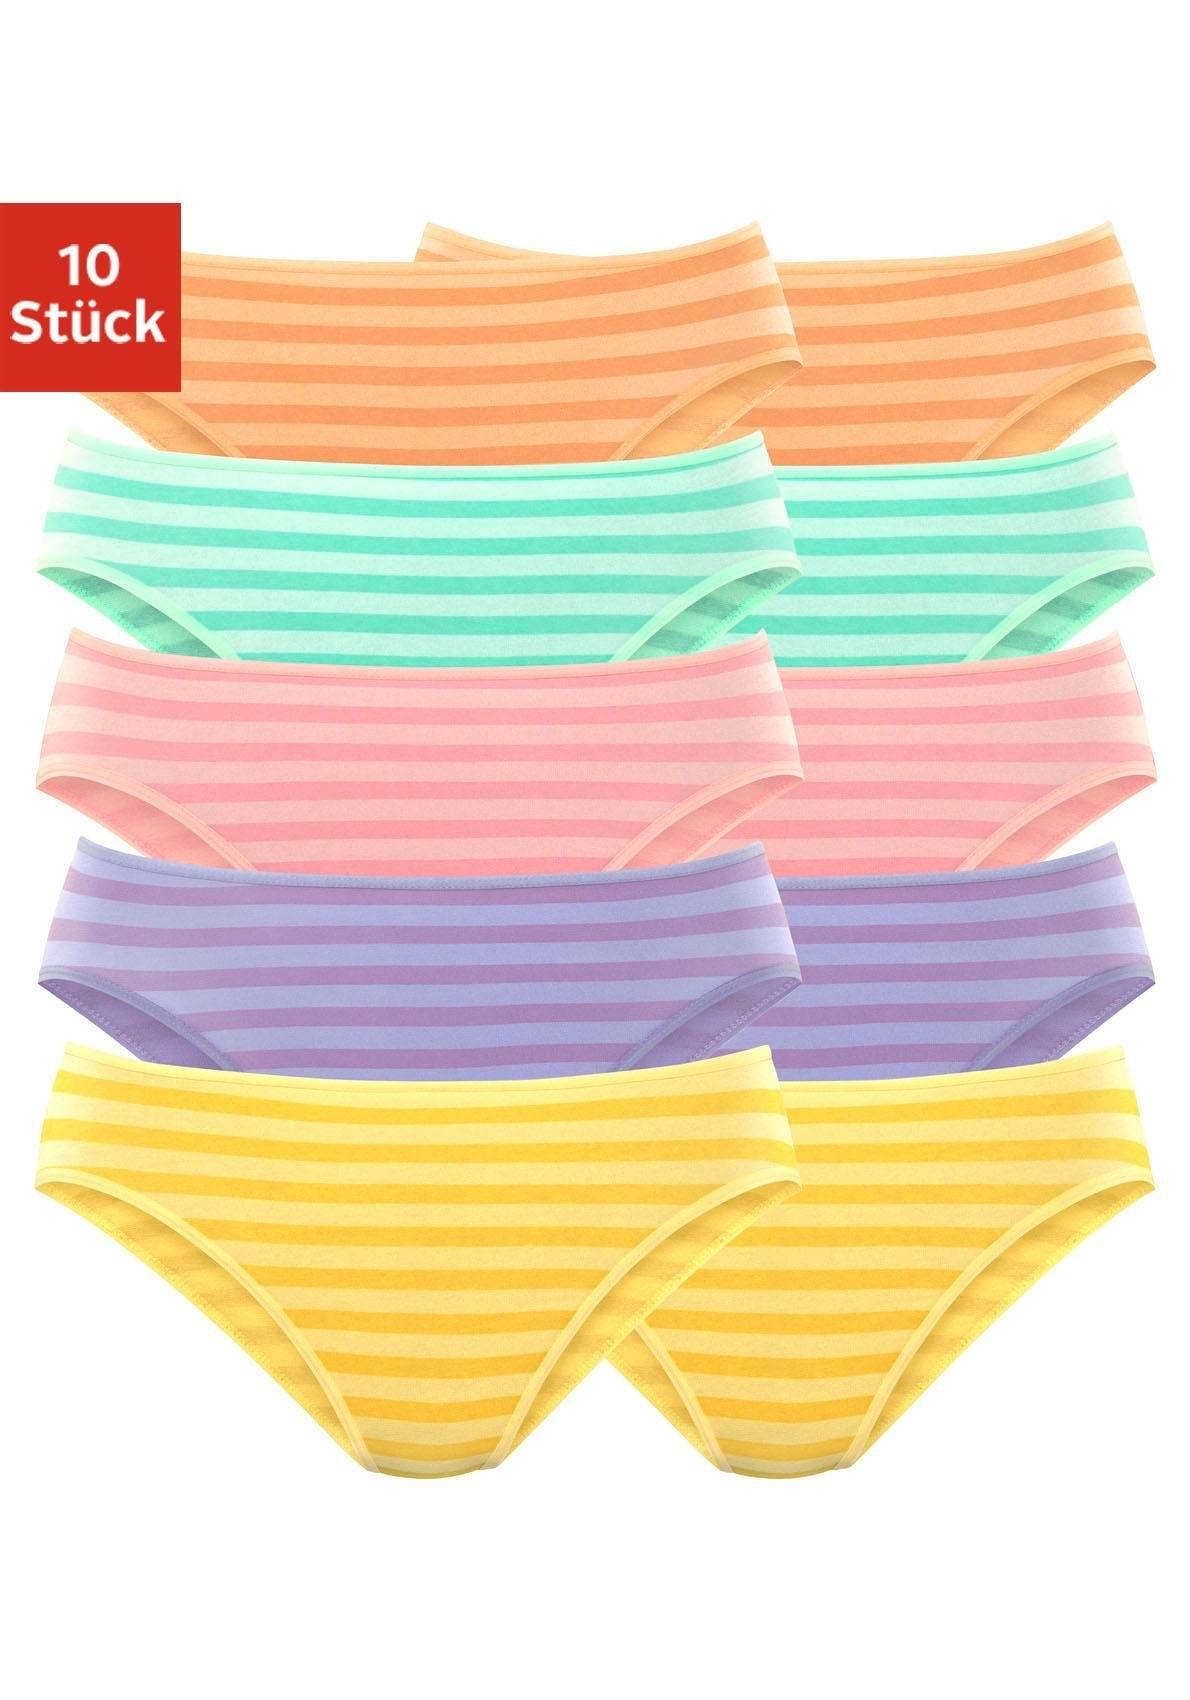 Go In Bikinislip, set van 10 veilig op lascana.nl kopen